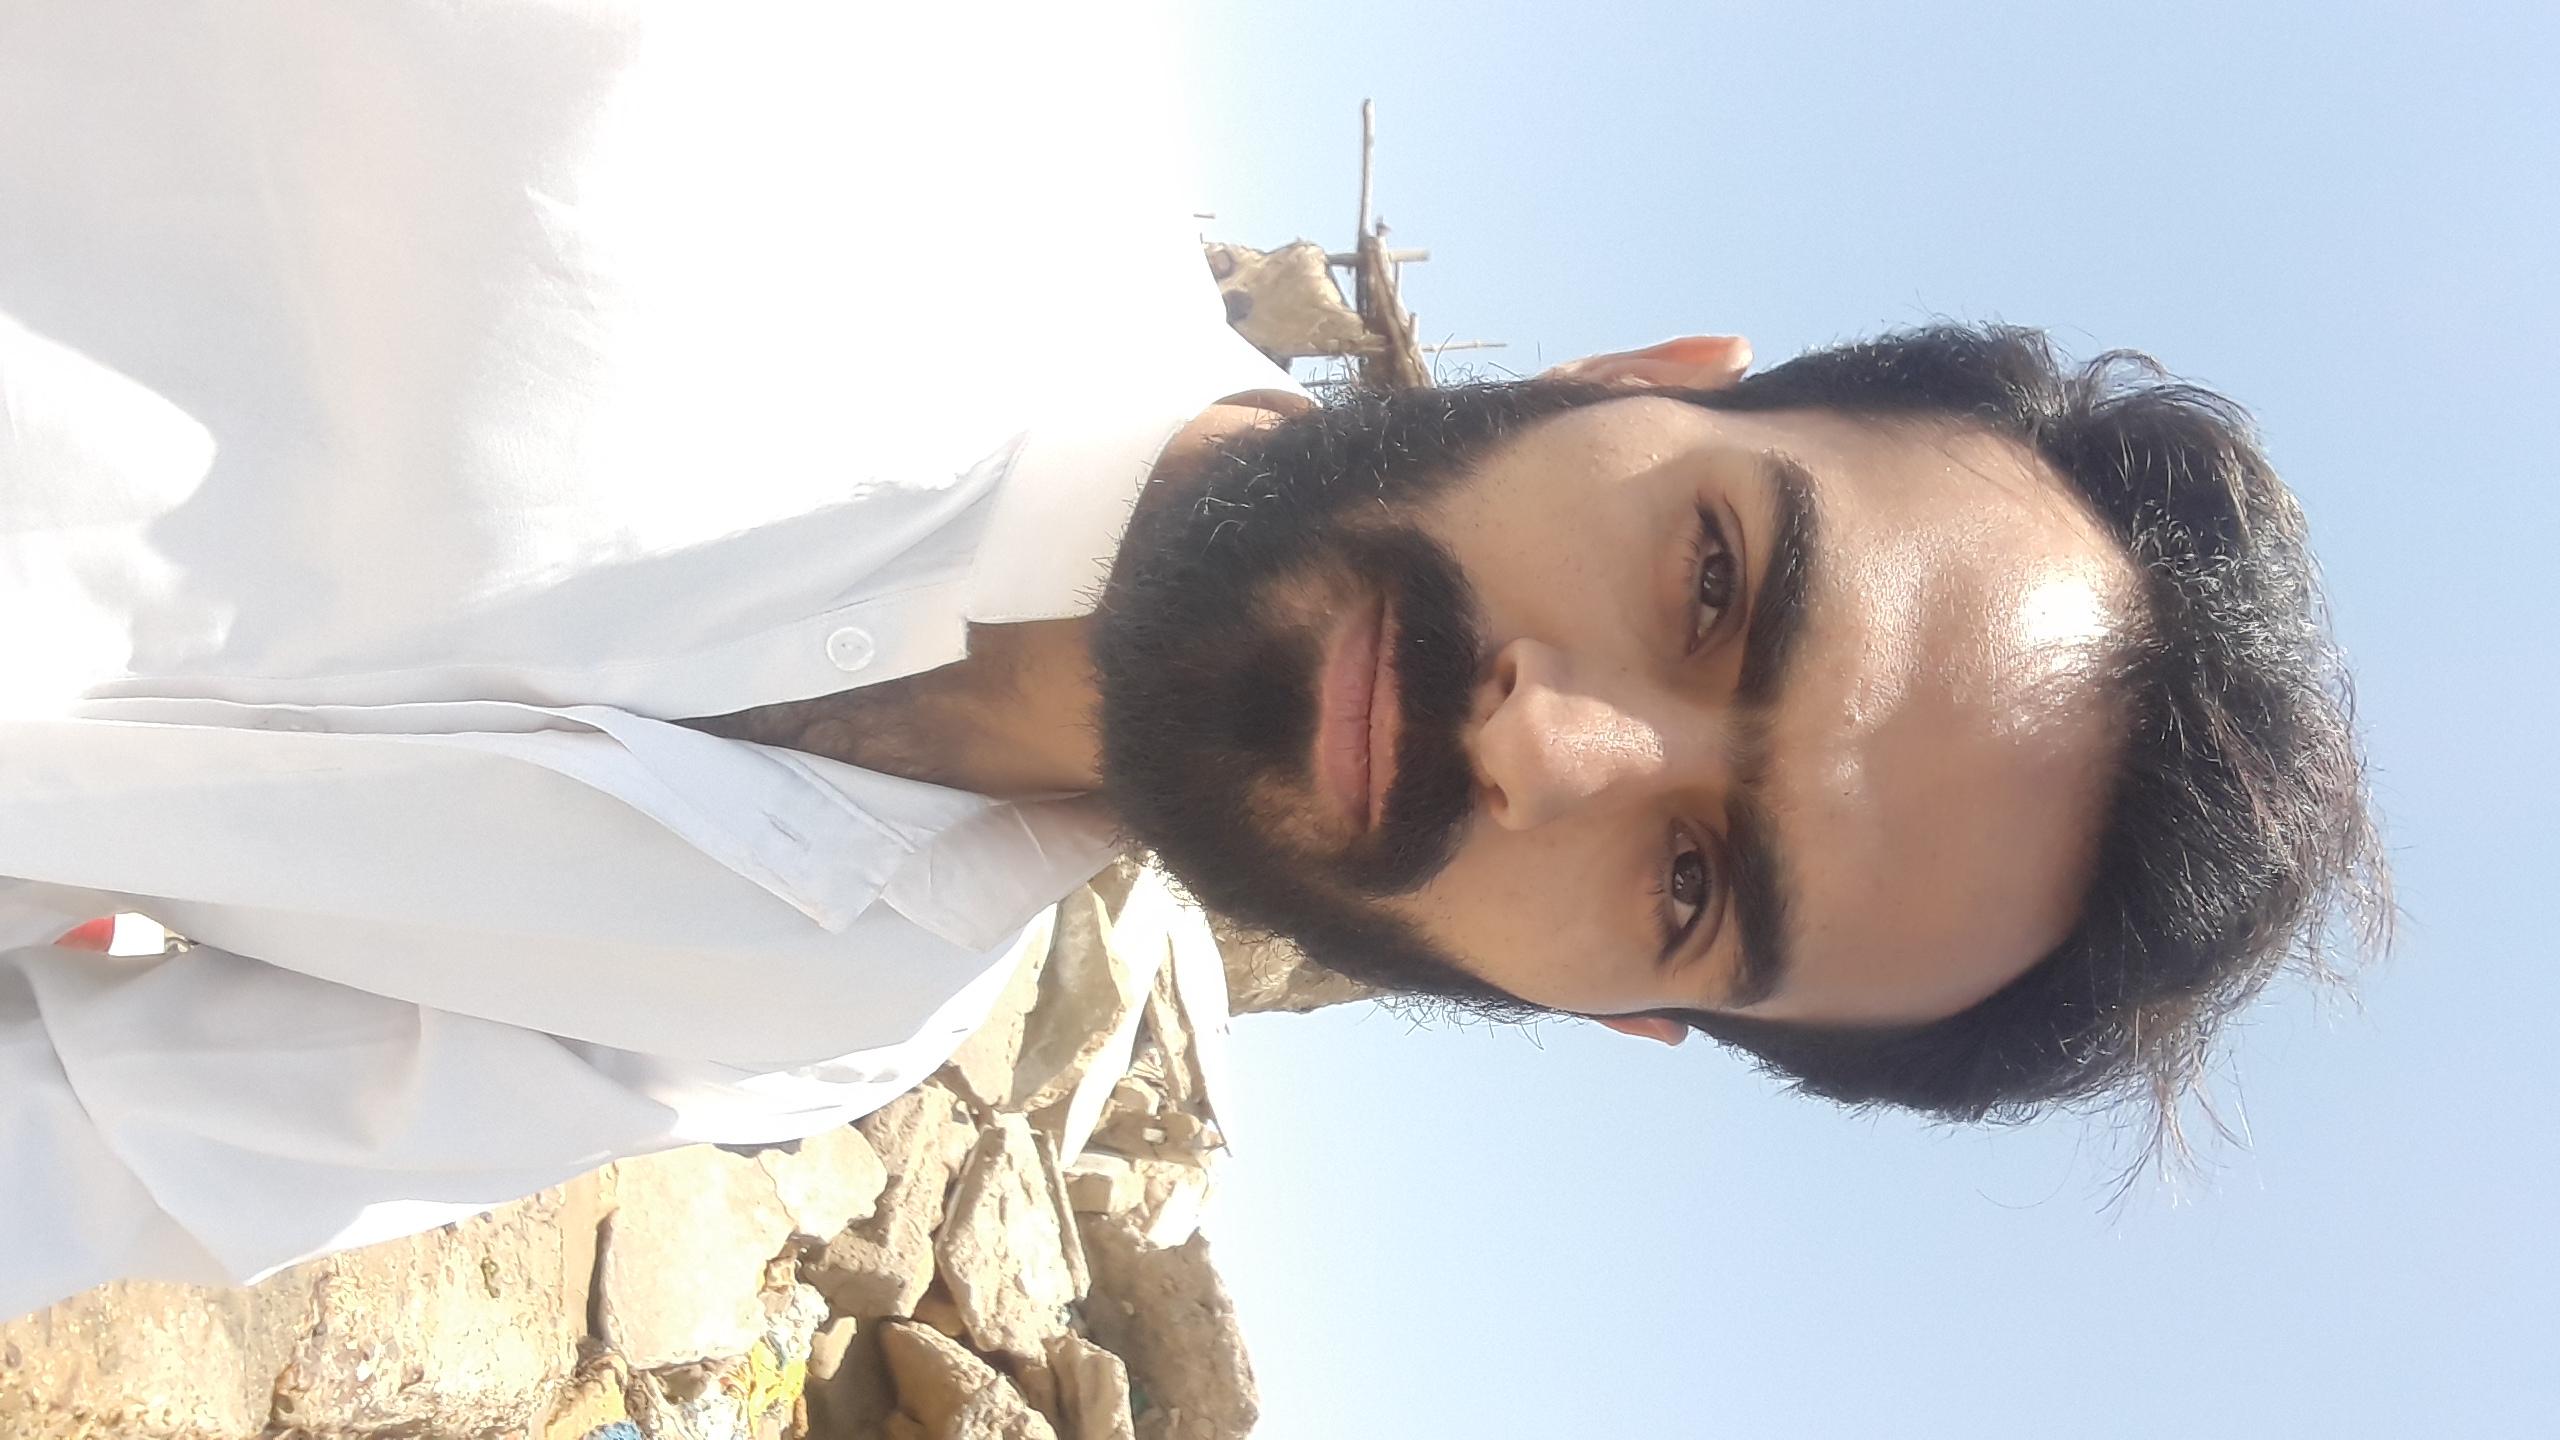 Muhammad Raheel